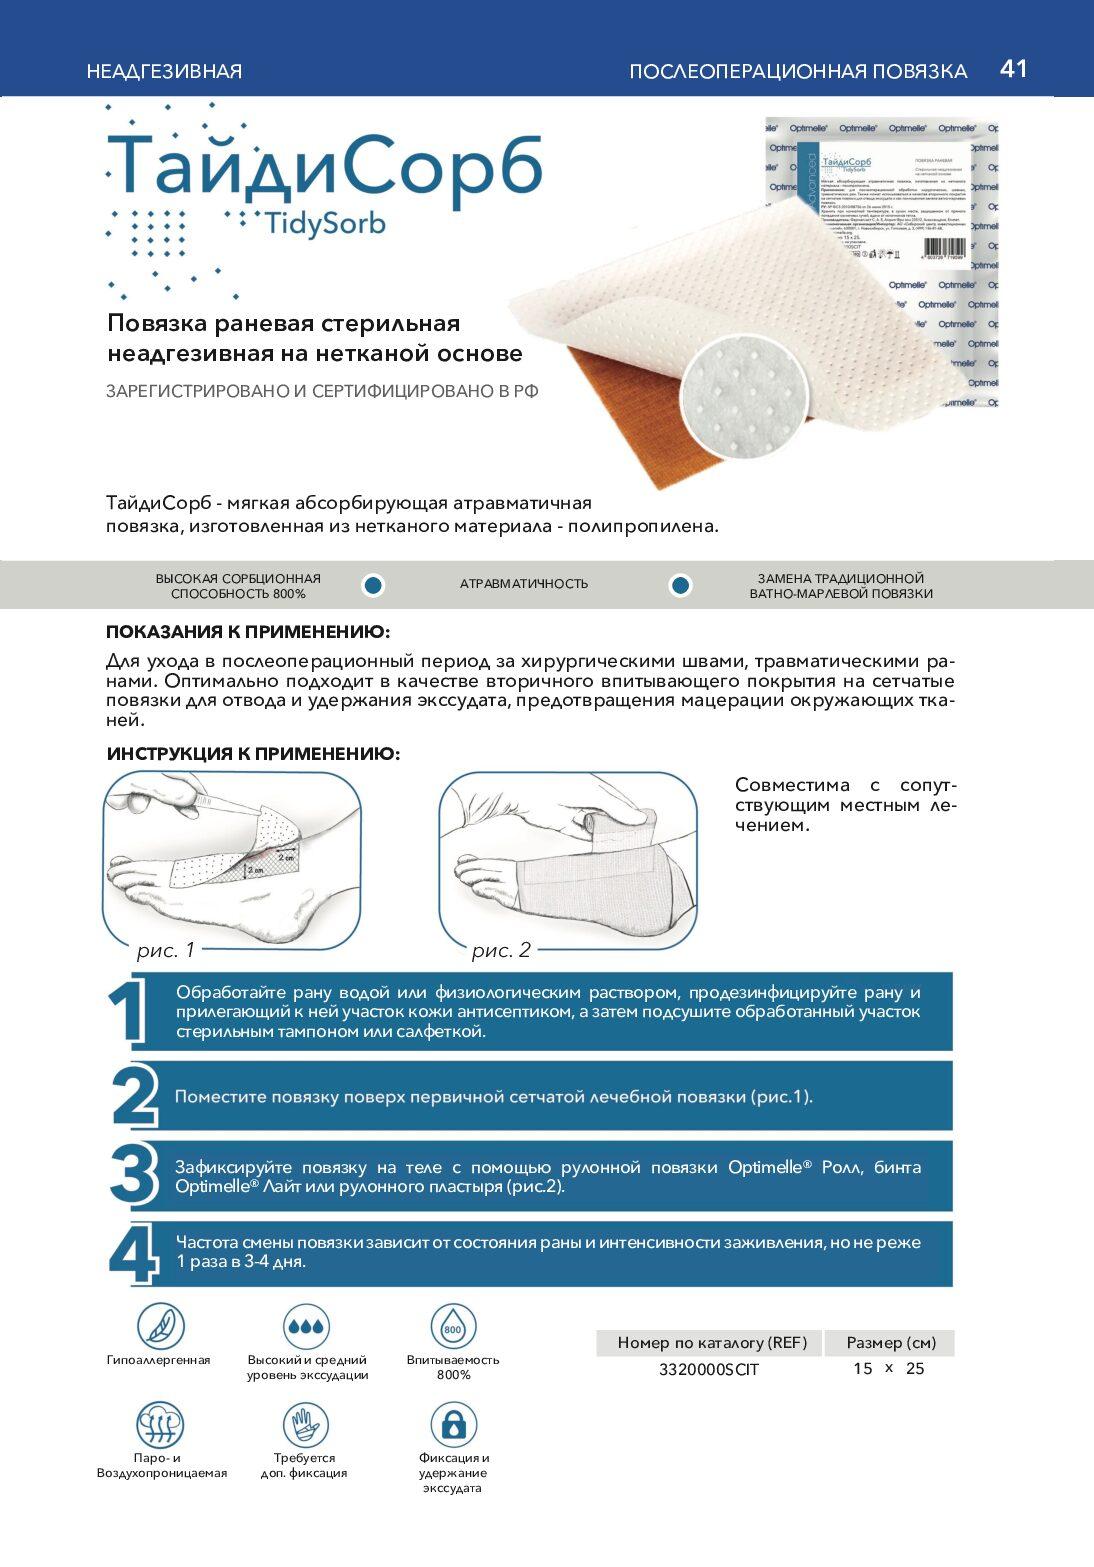 продукции Optimelle2 1 60 41 pdf